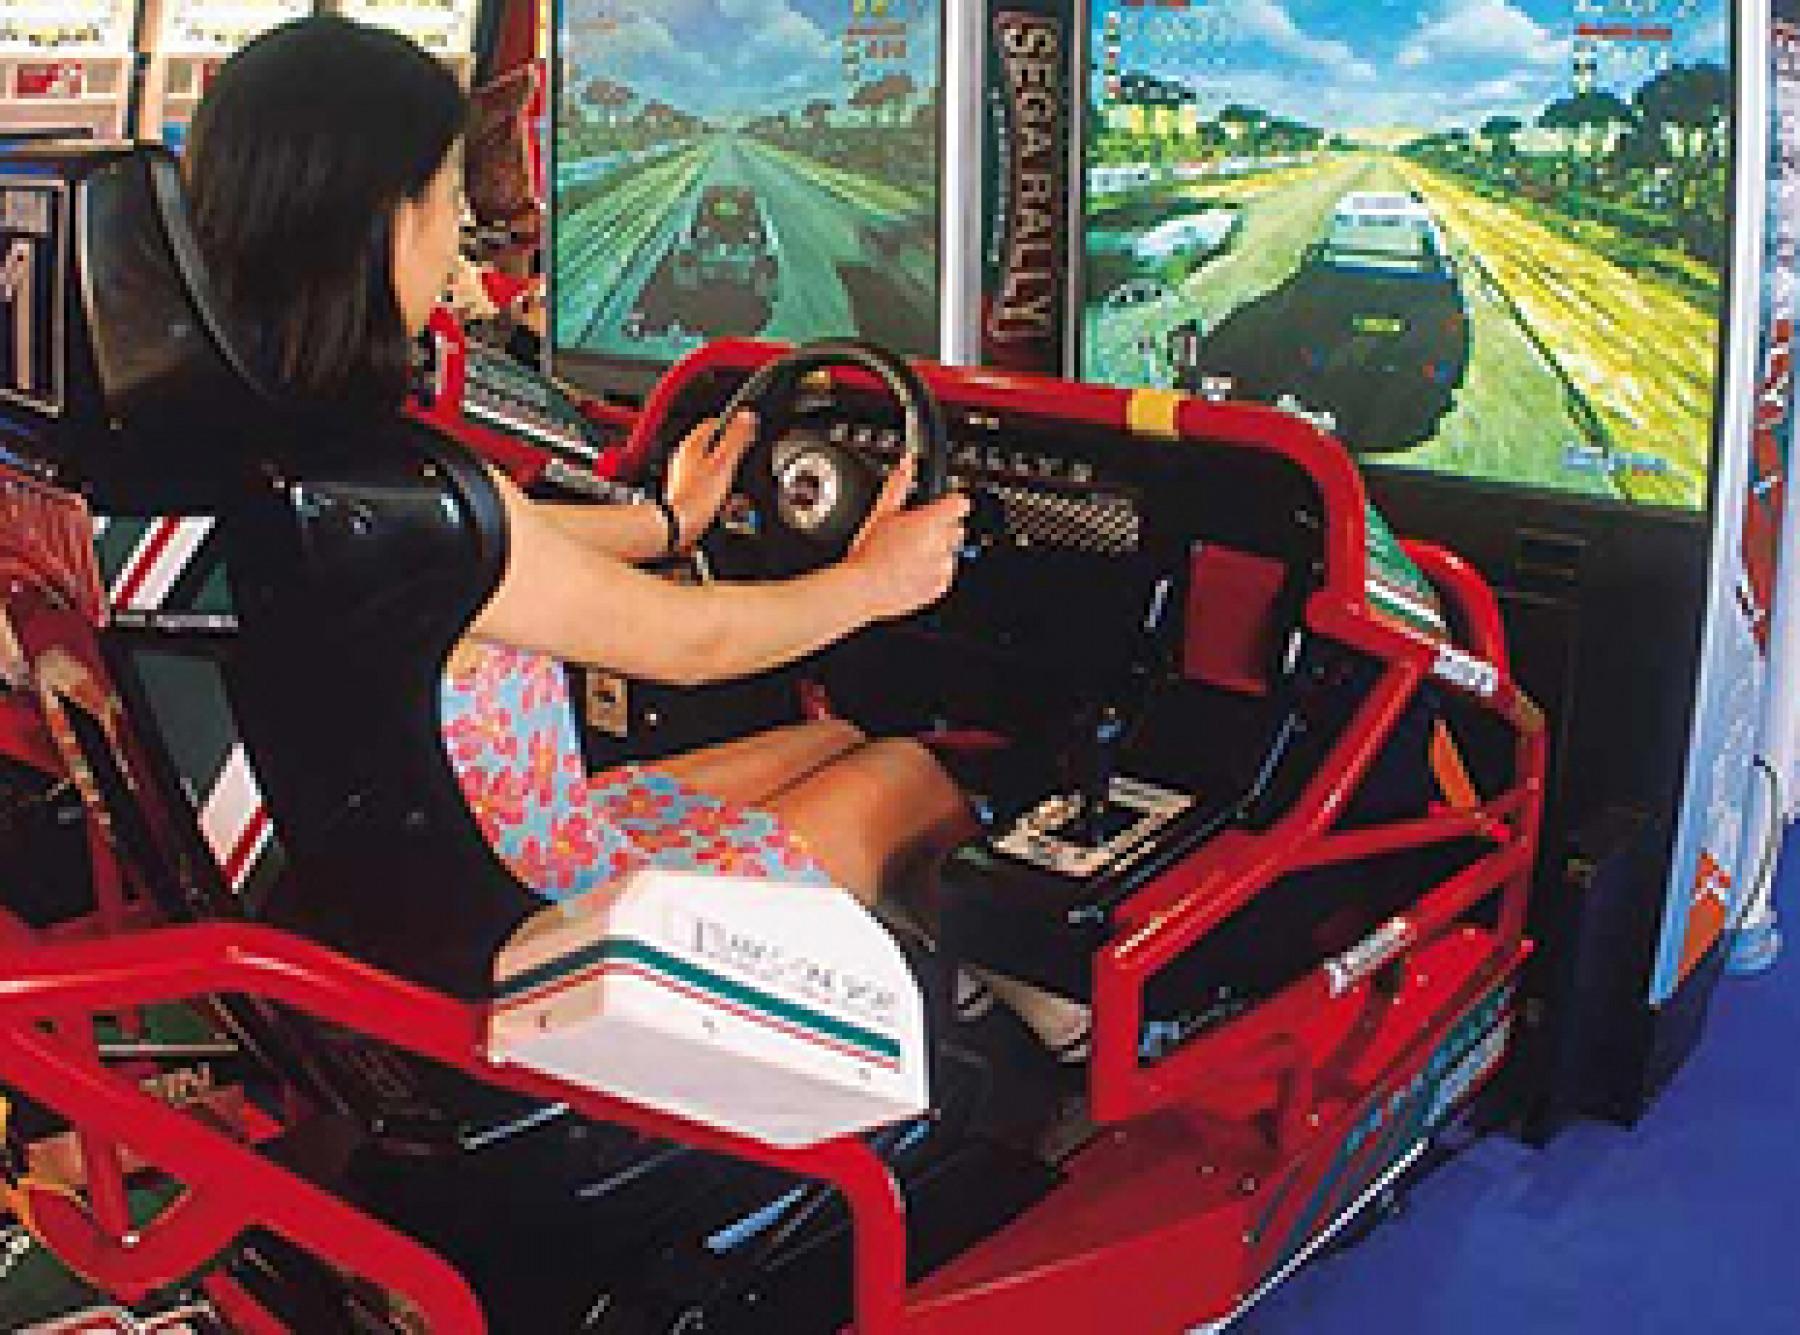 Norwegian Cruise Line Norwegian Spirit Interior Video Arcade.jpg